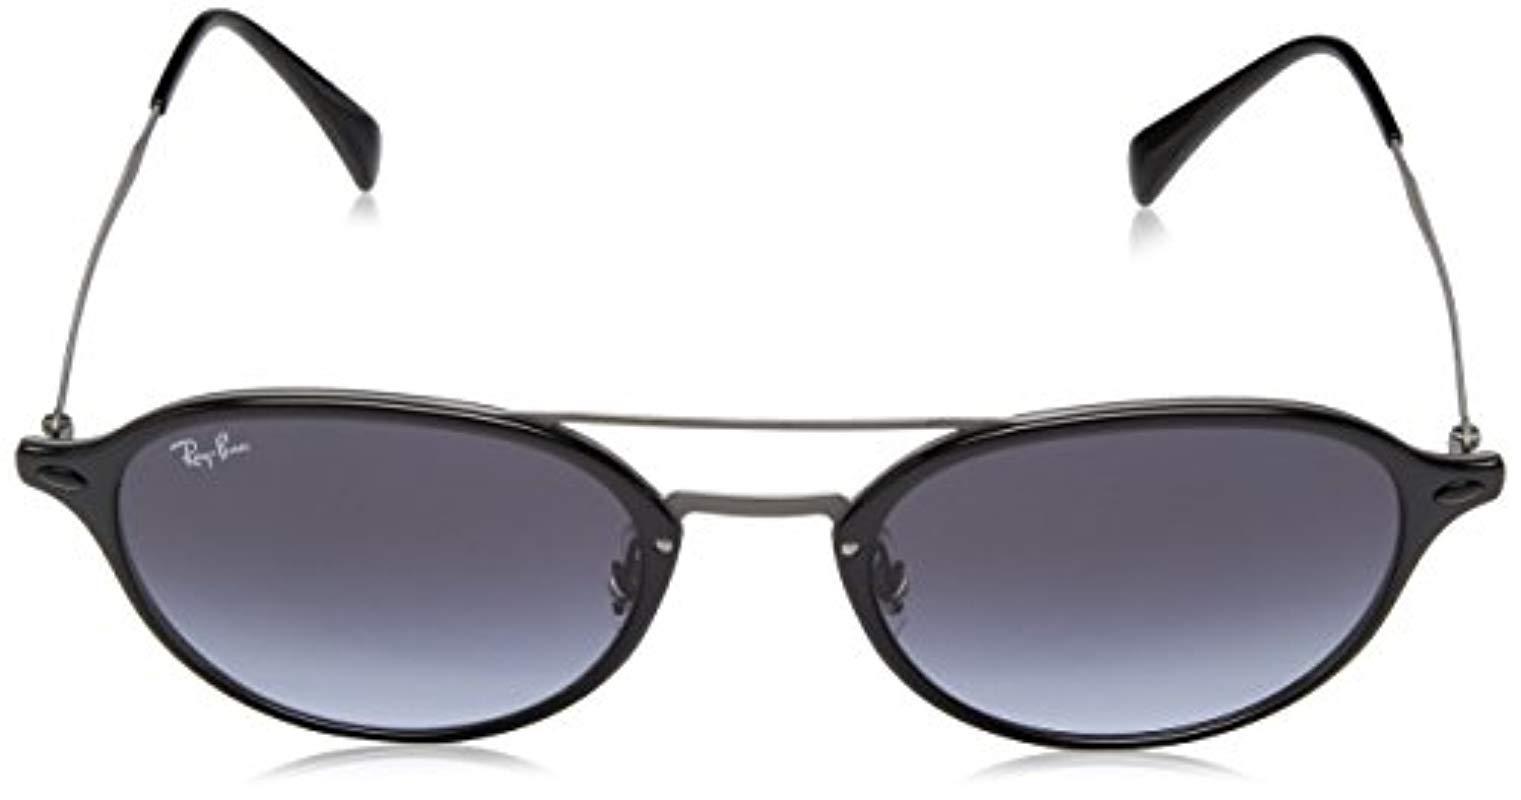 13846ee86f Ray-Ban - Black Rb4287 Sunglasses for Men - Lyst. View fullscreen